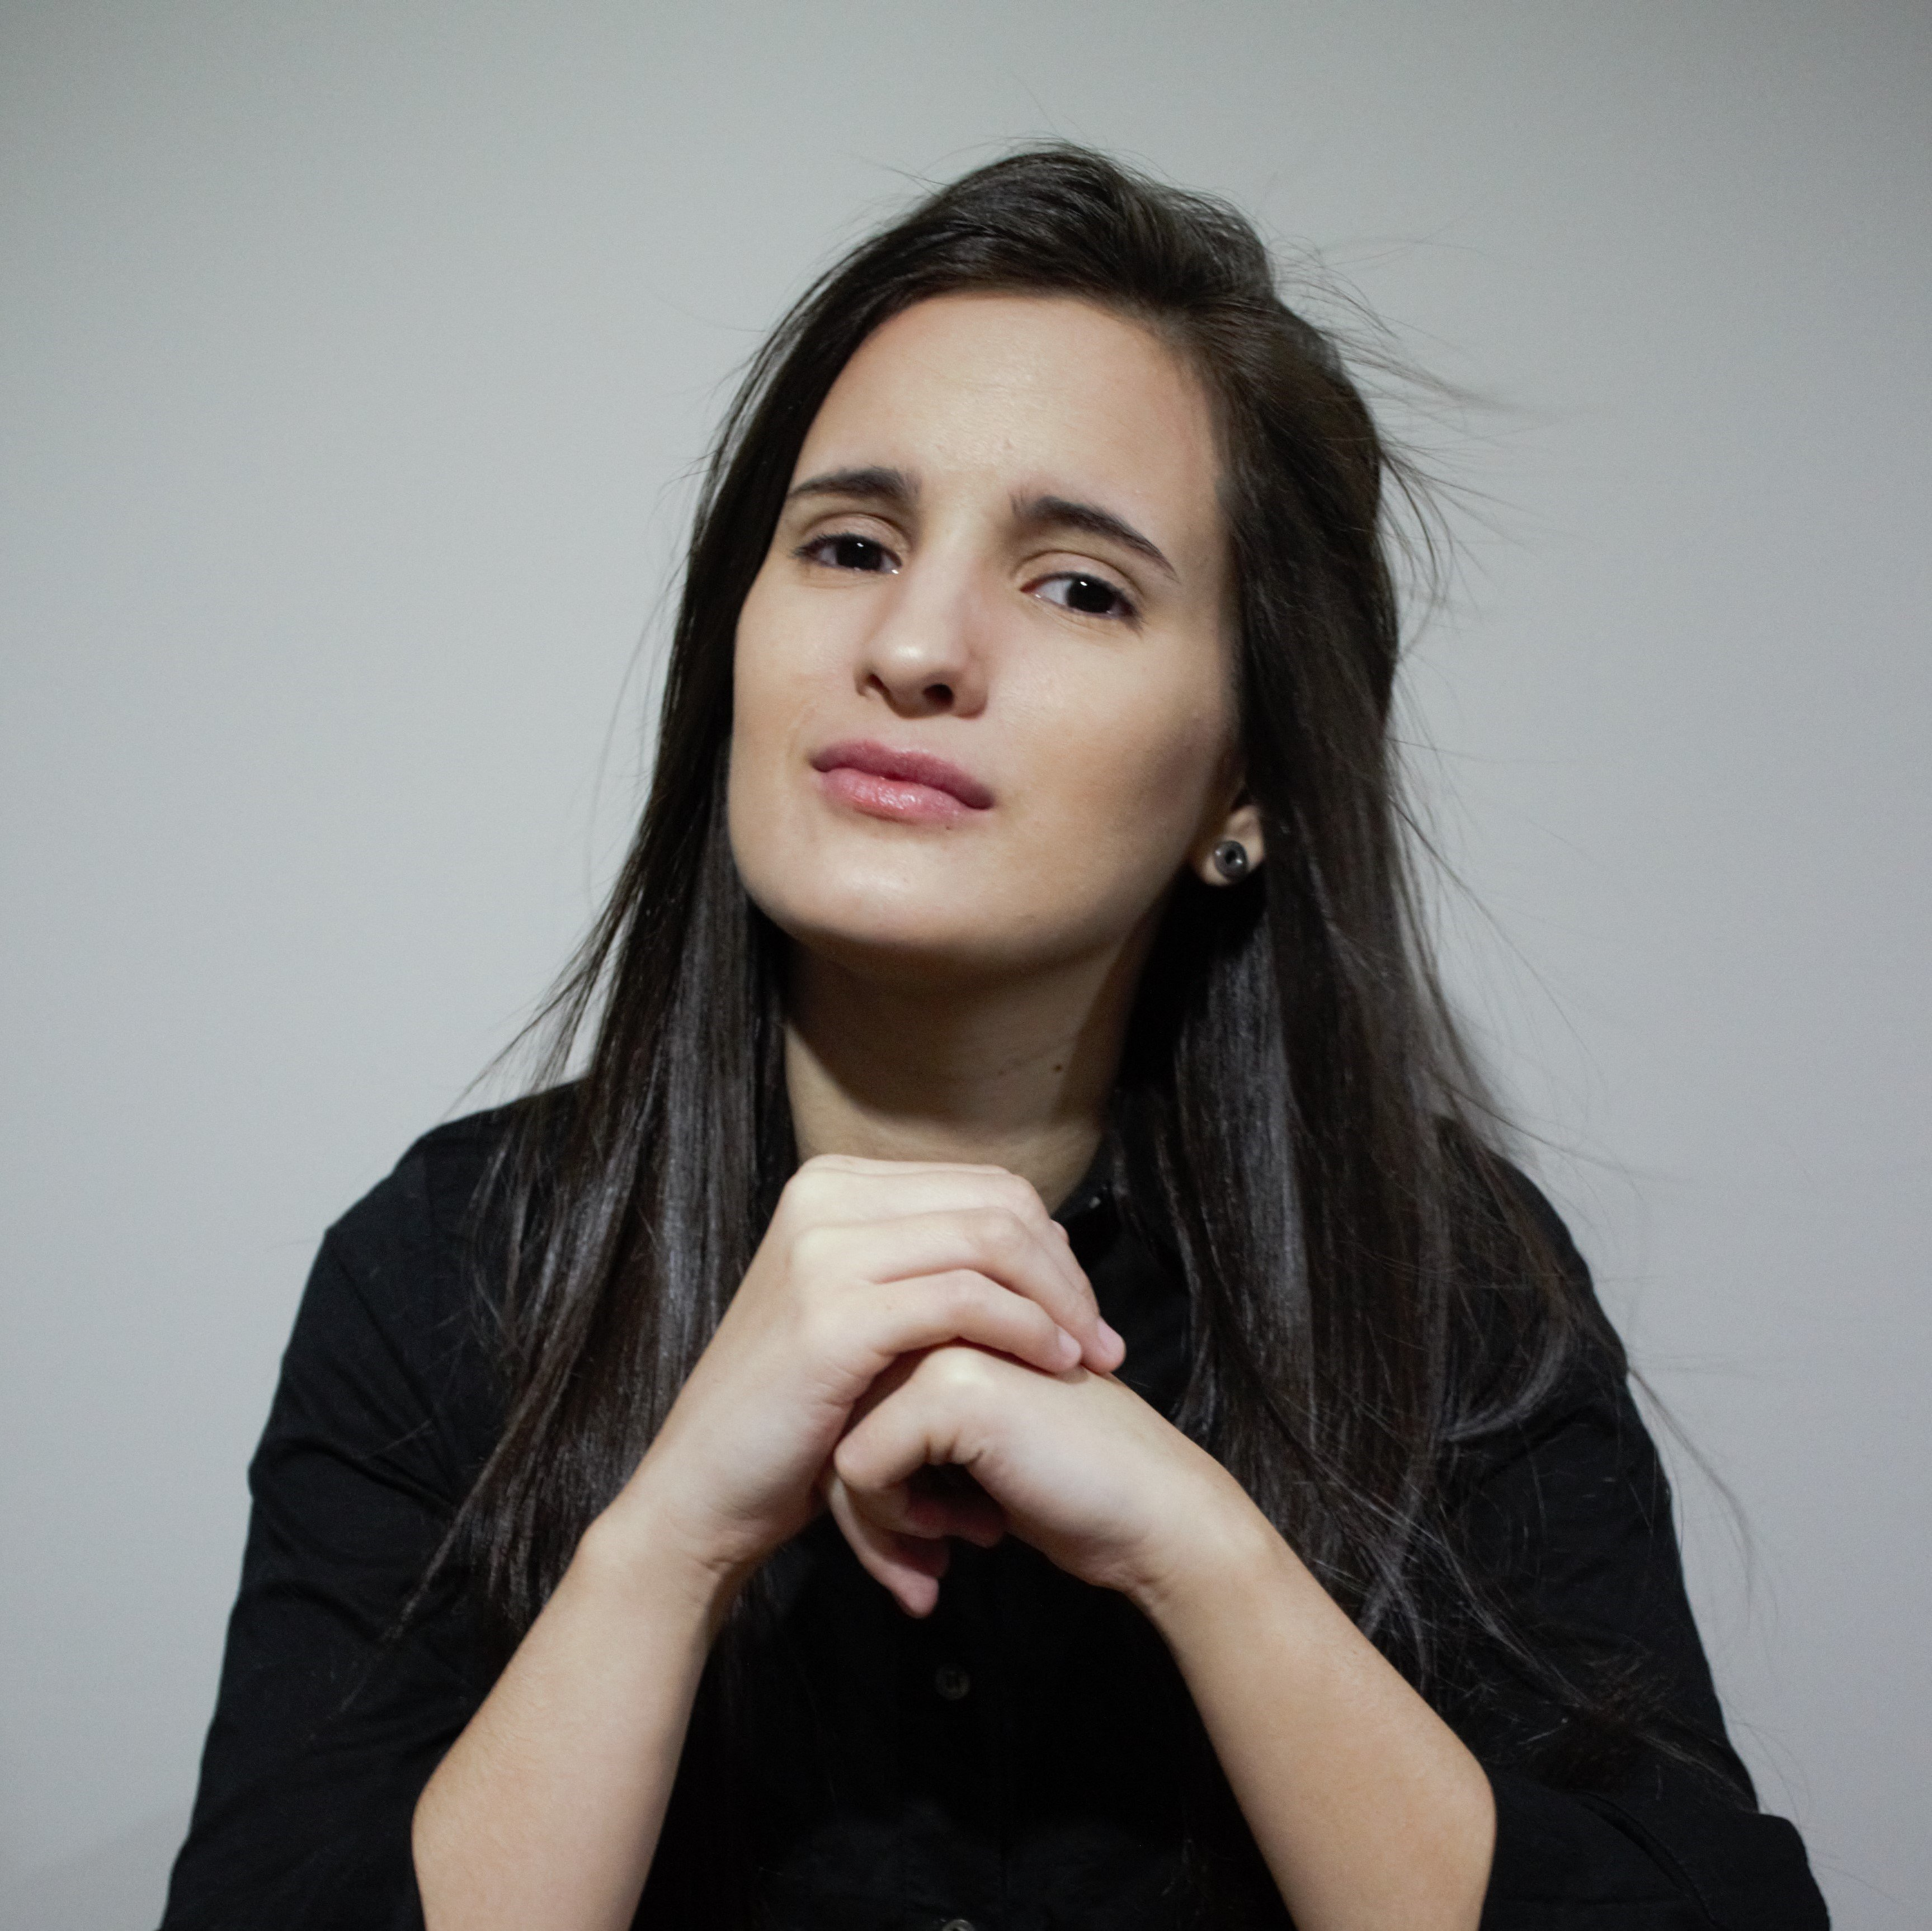 Sophie Carreras